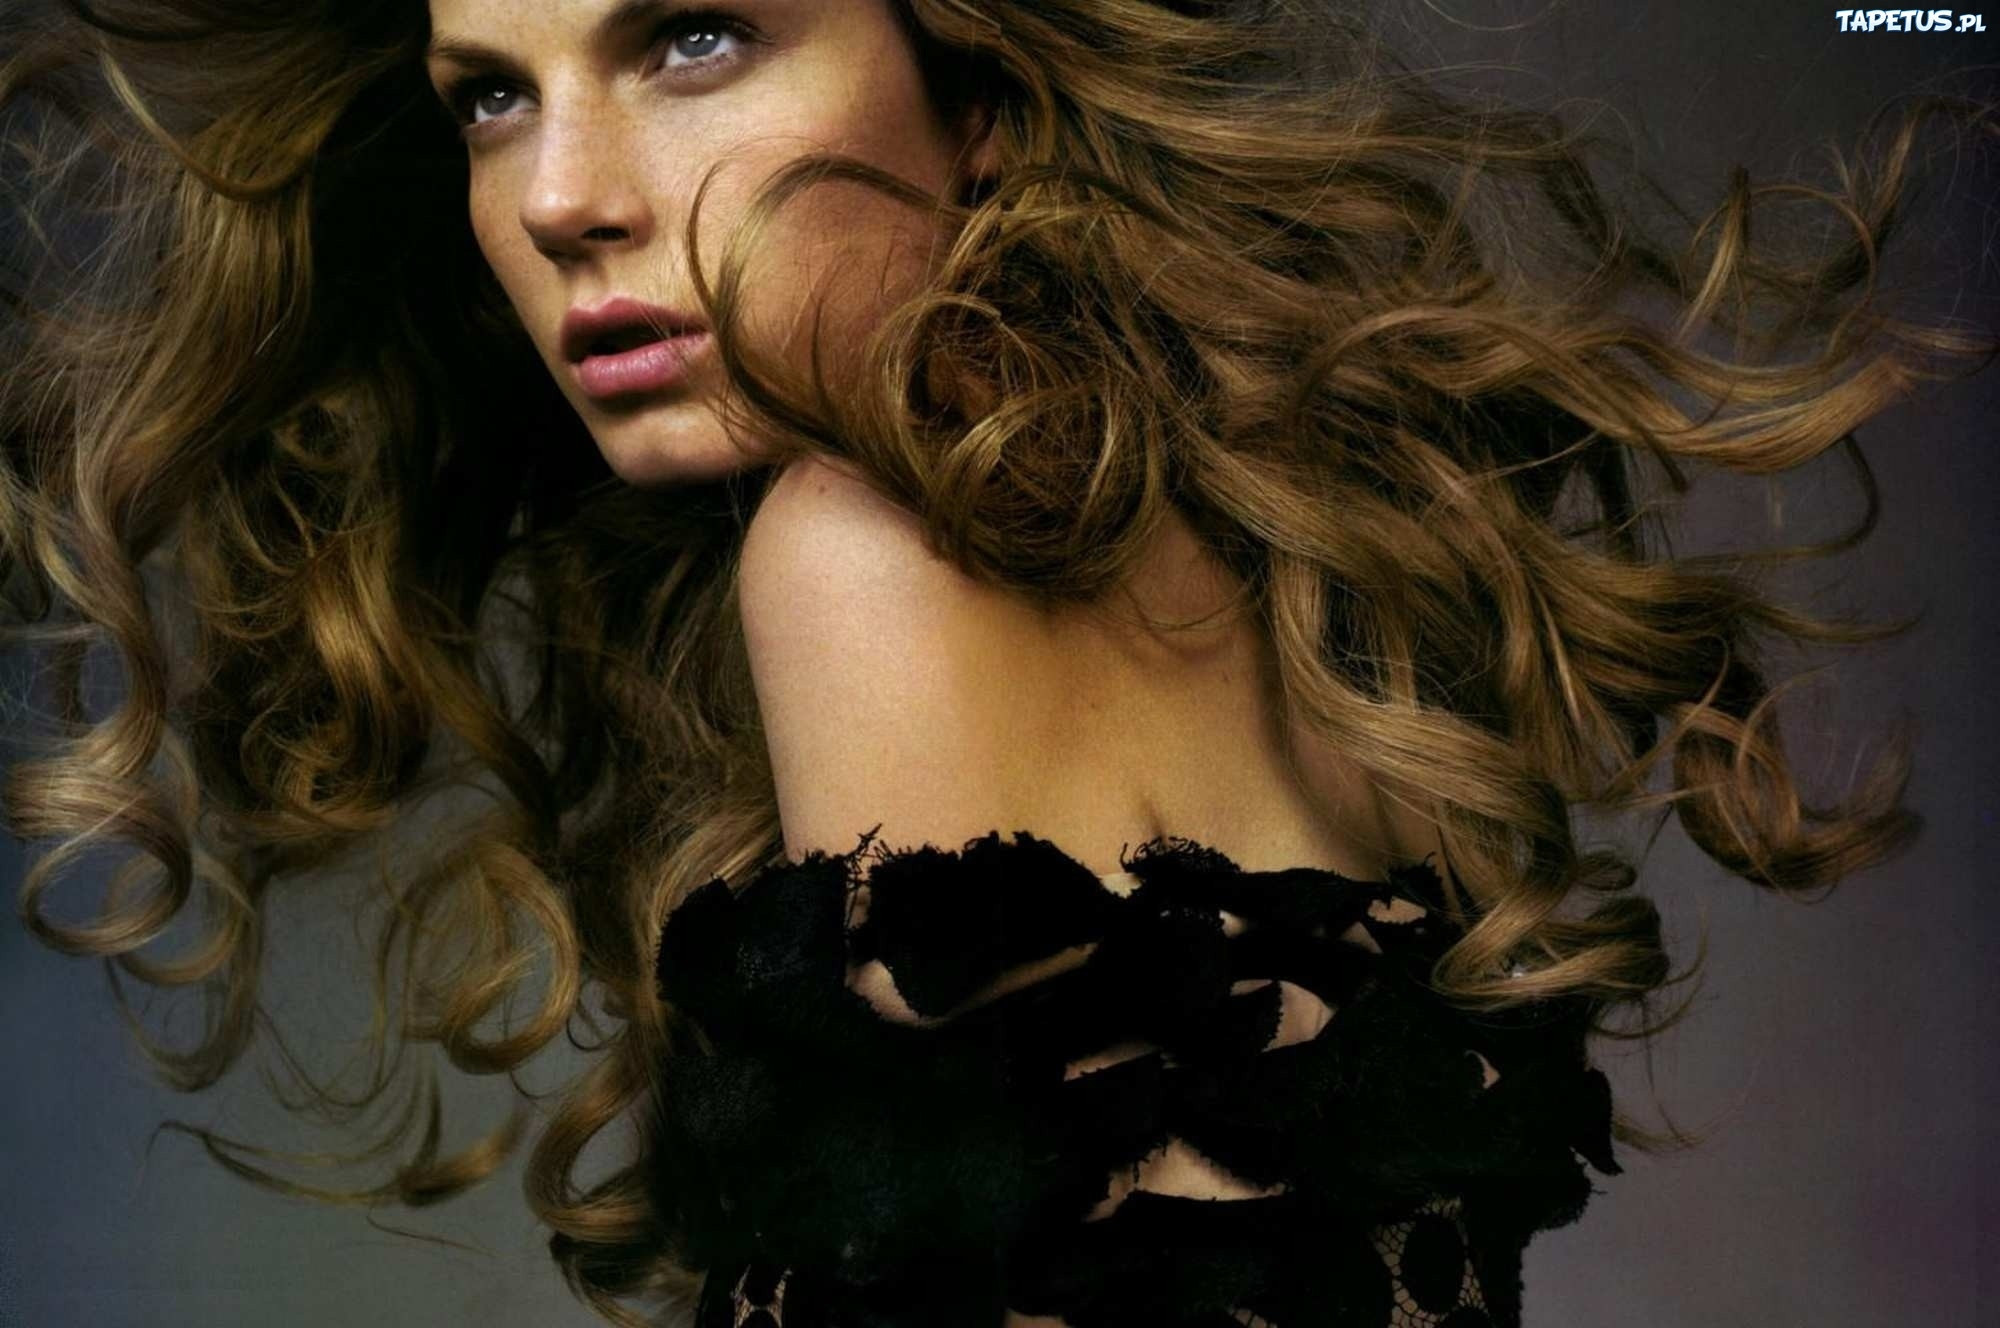 Classify Swedish-American Model Angela Lindvall